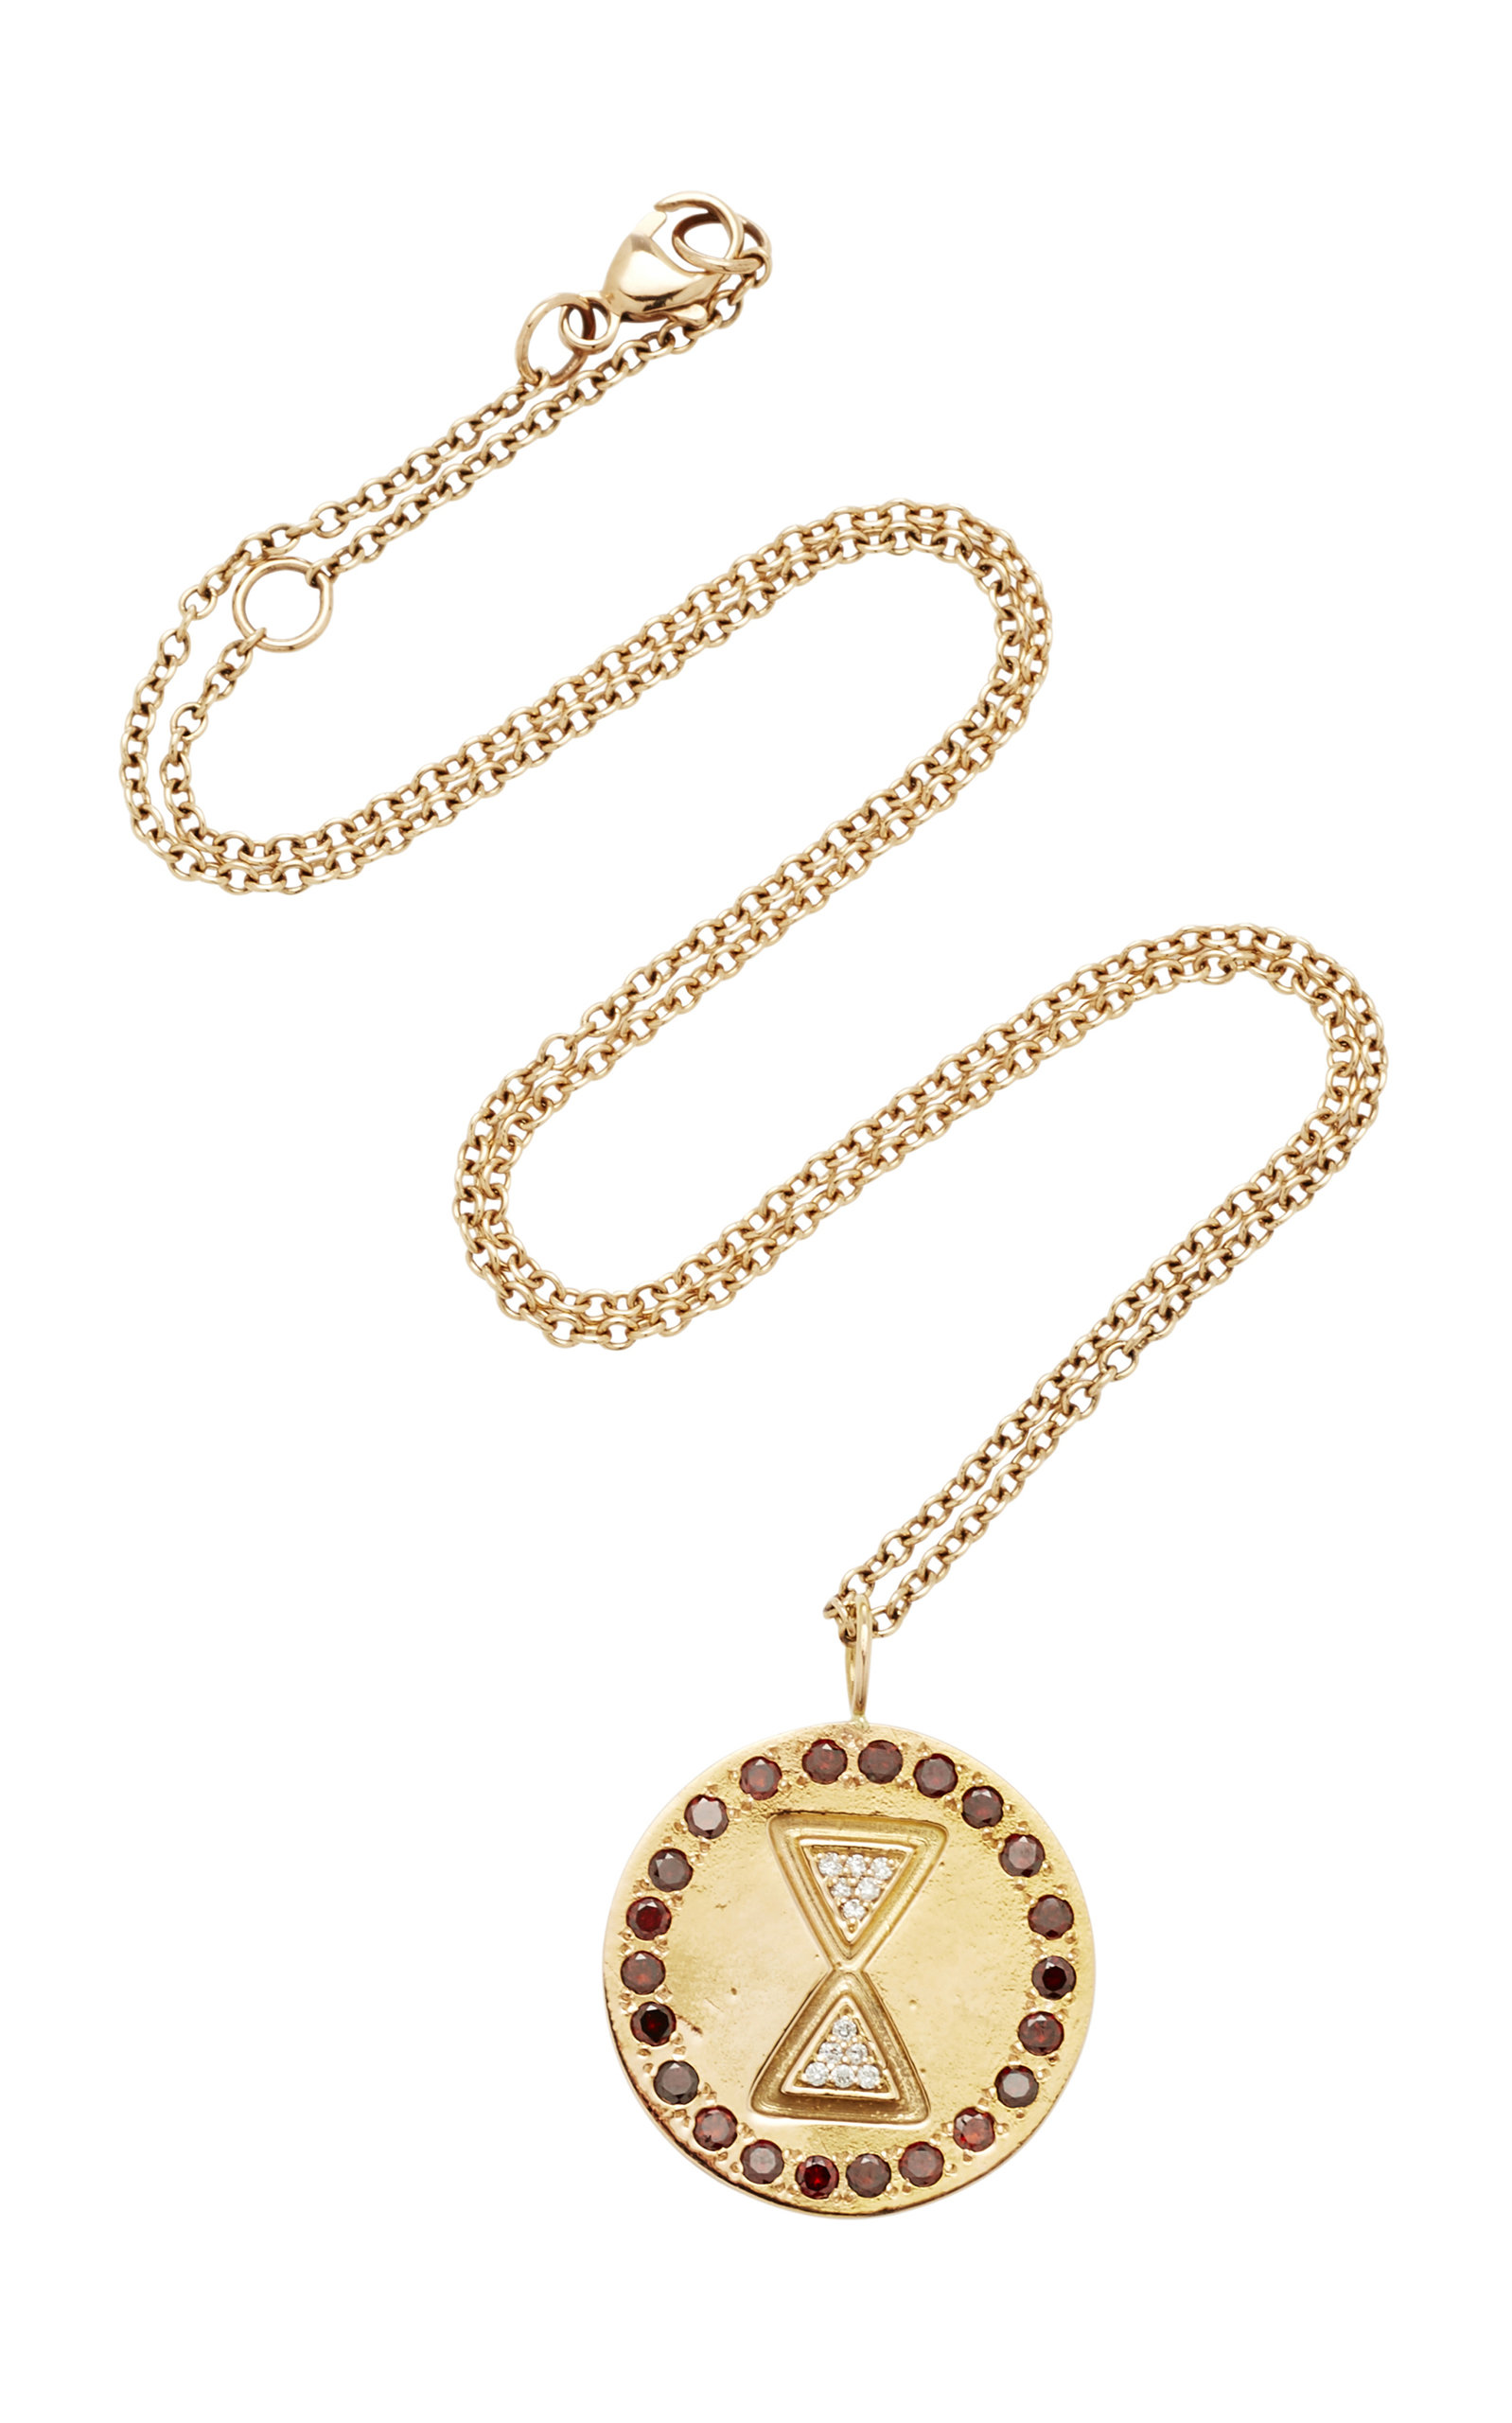 MISAHARA UNITY CHARM 18K ROSE GOLD DIAMOND NECKLACE